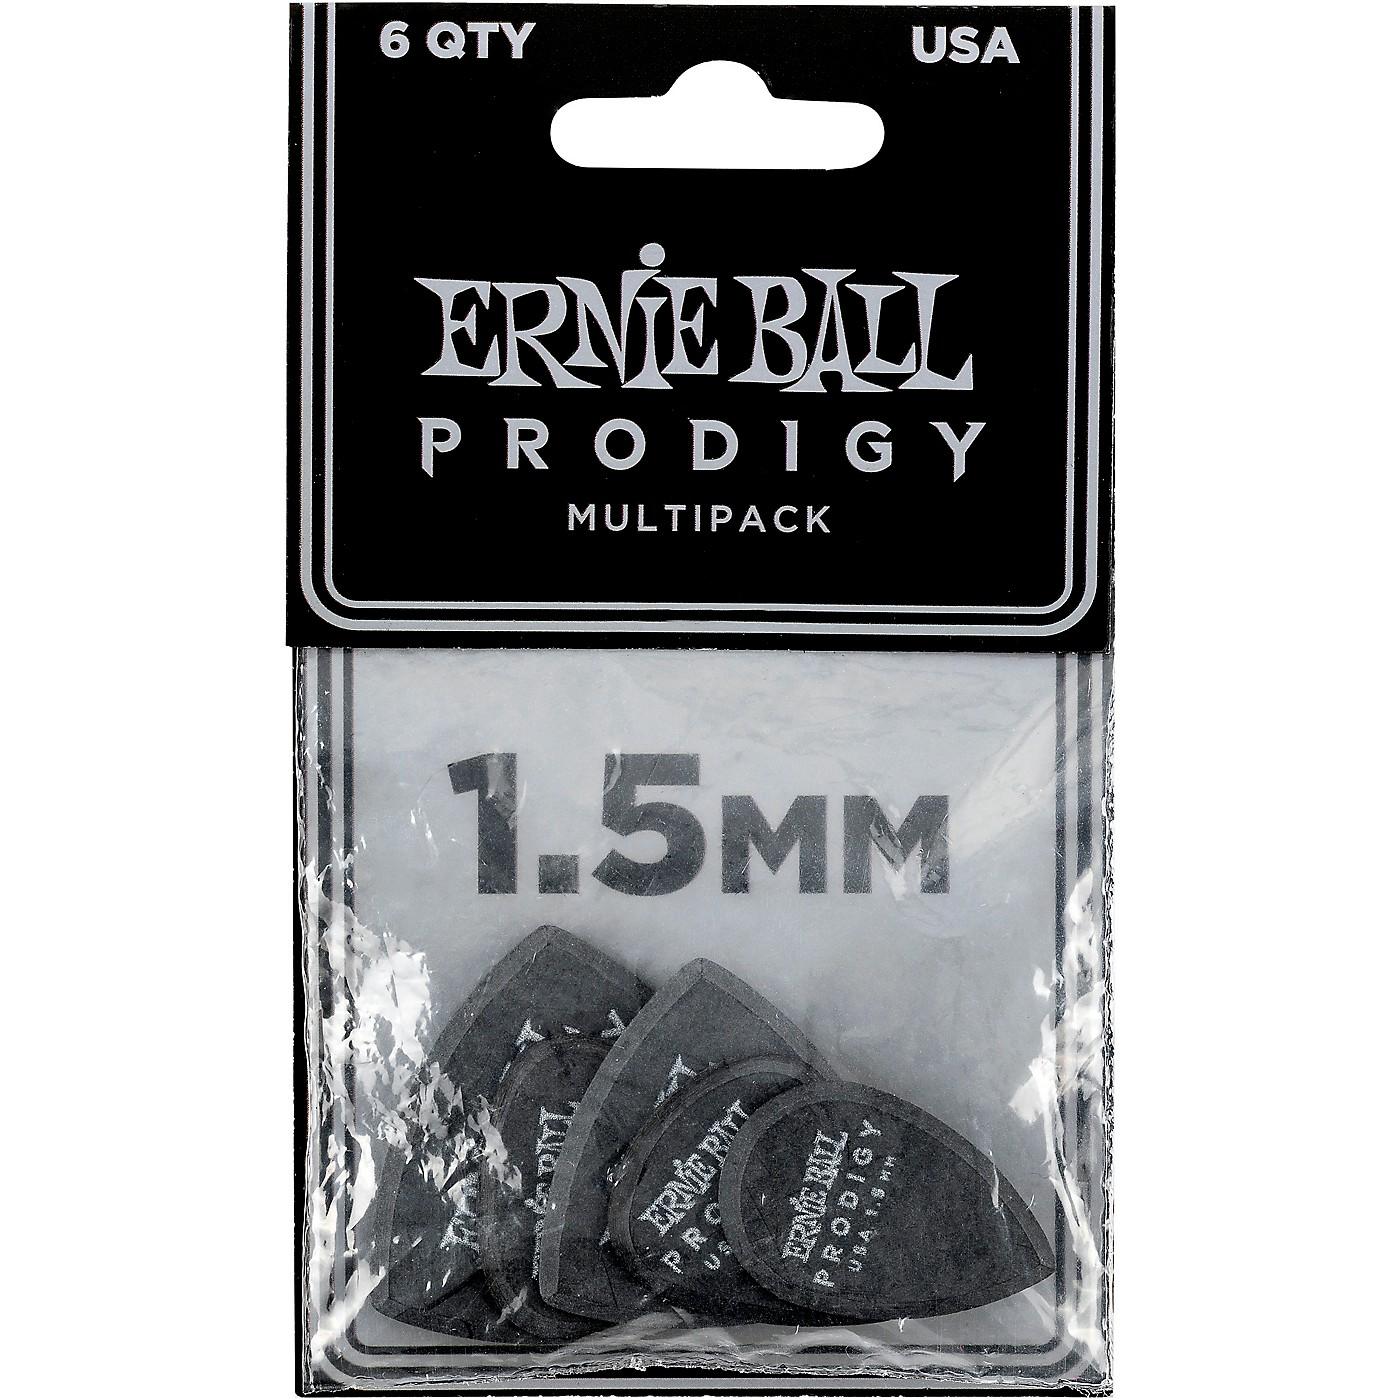 Ernie Ball Prodigy Multipack thumbnail